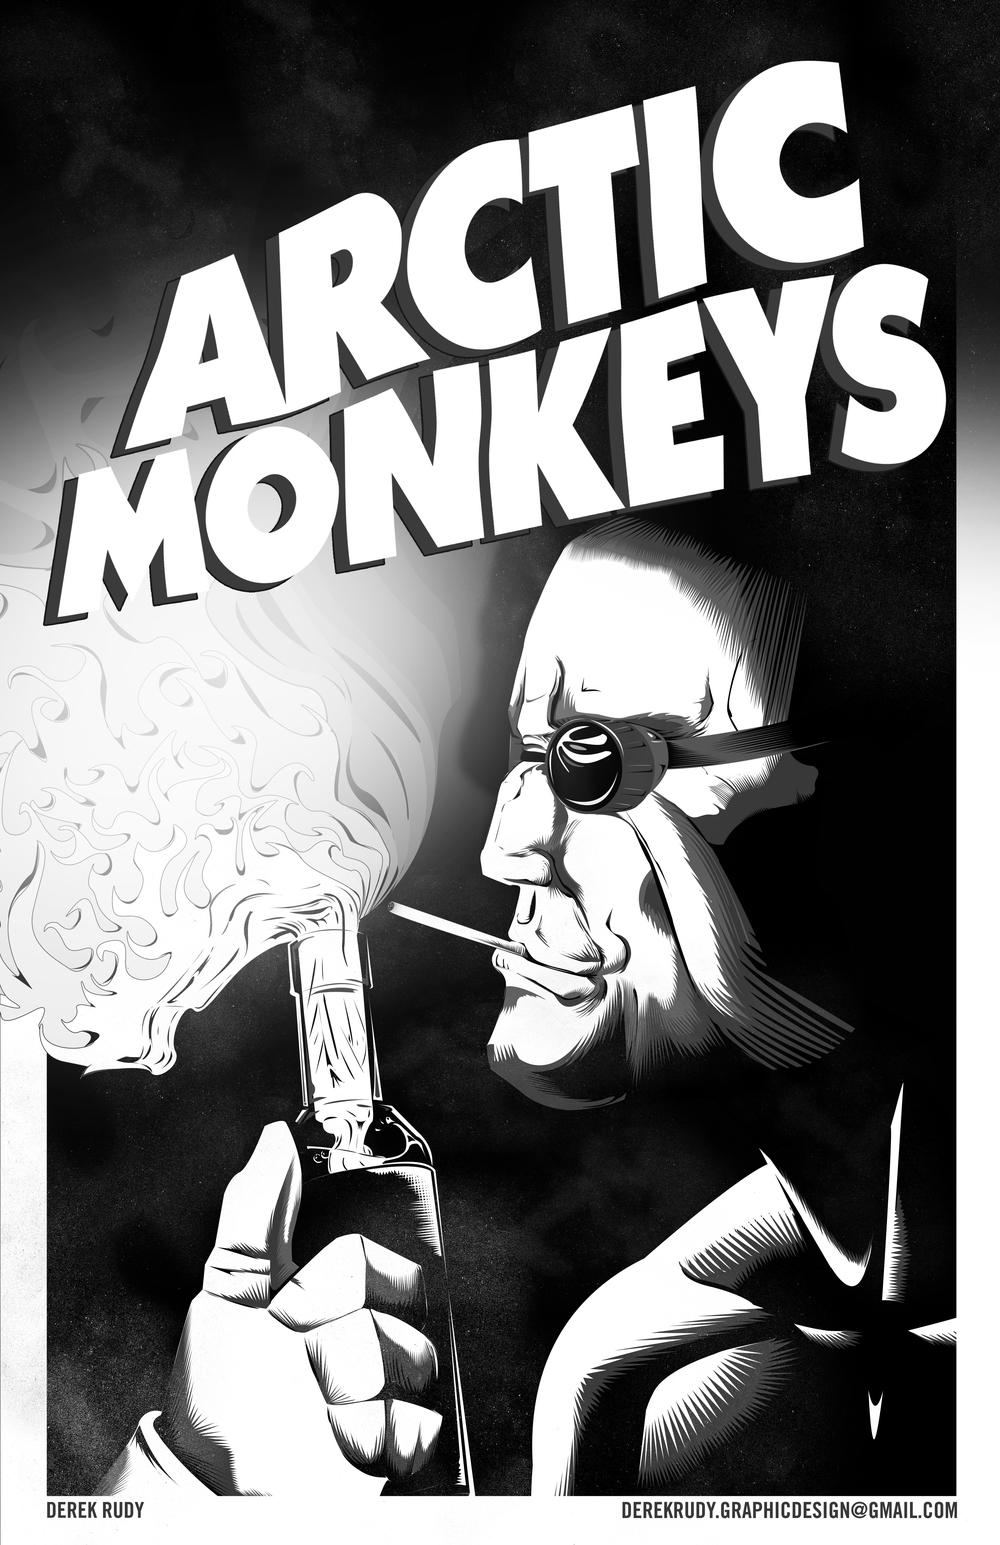 ArcticMonkeysFinalDraft_11x17_#1_Website.jpg